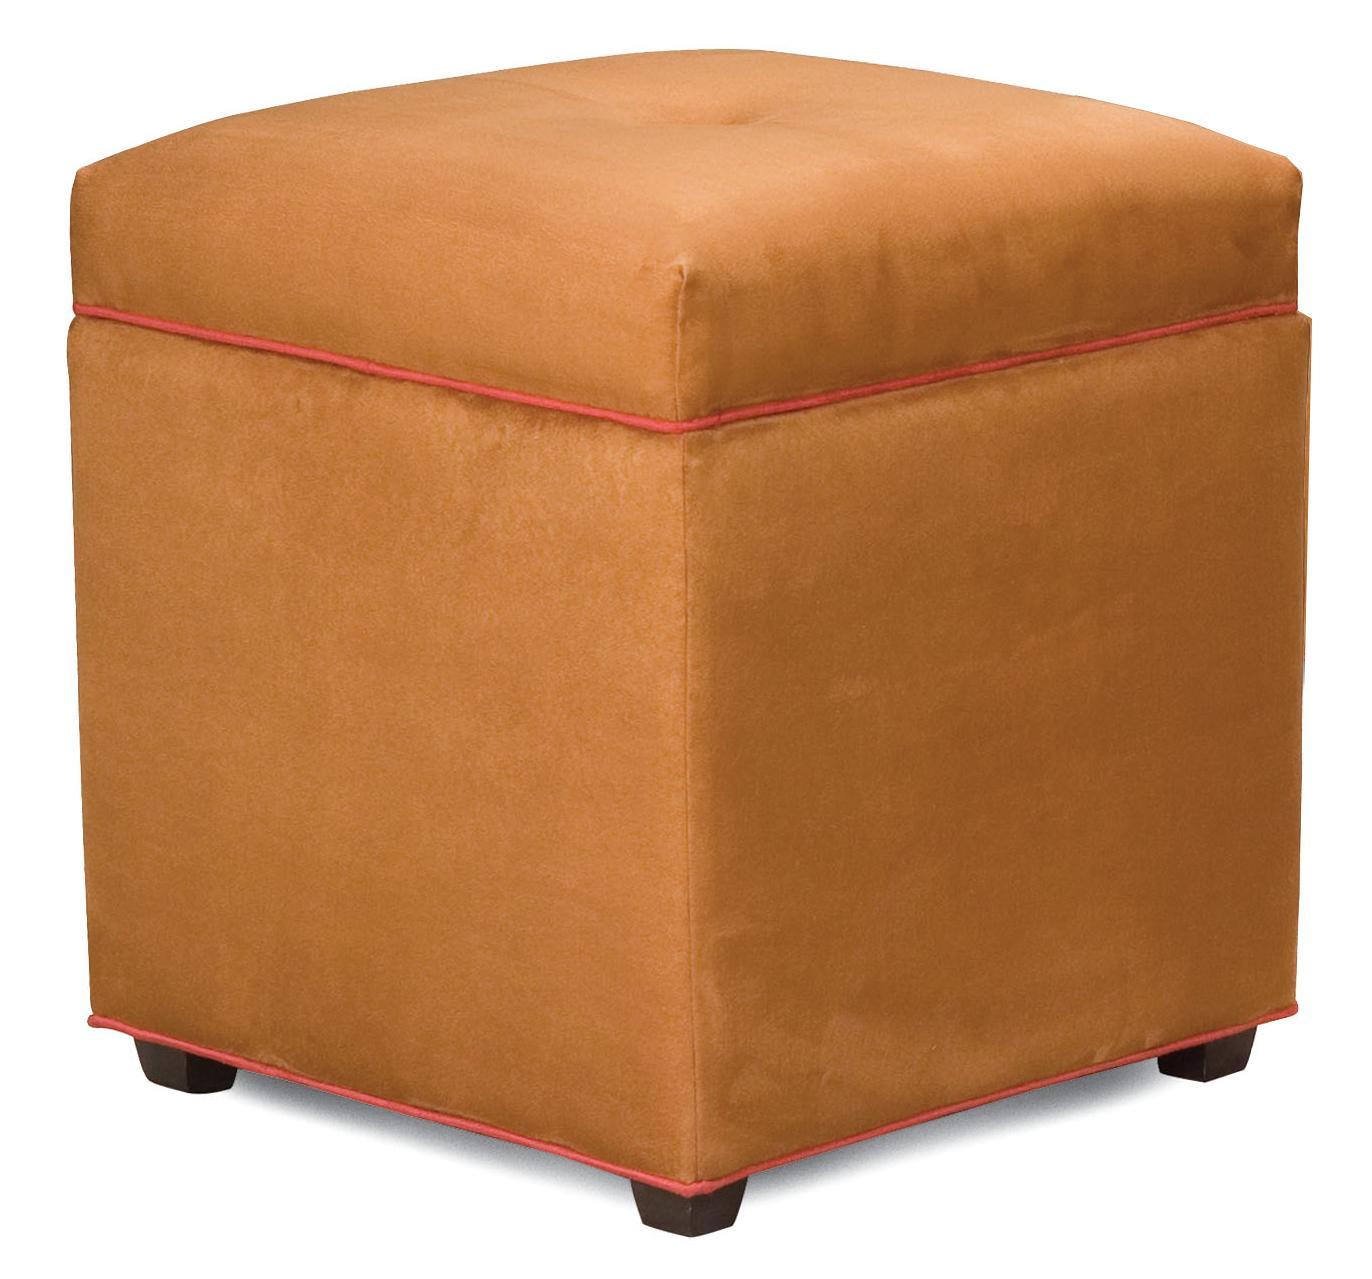 Ottomans Storage Ottoman by Fairfield at Jacksonville Furniture Mart